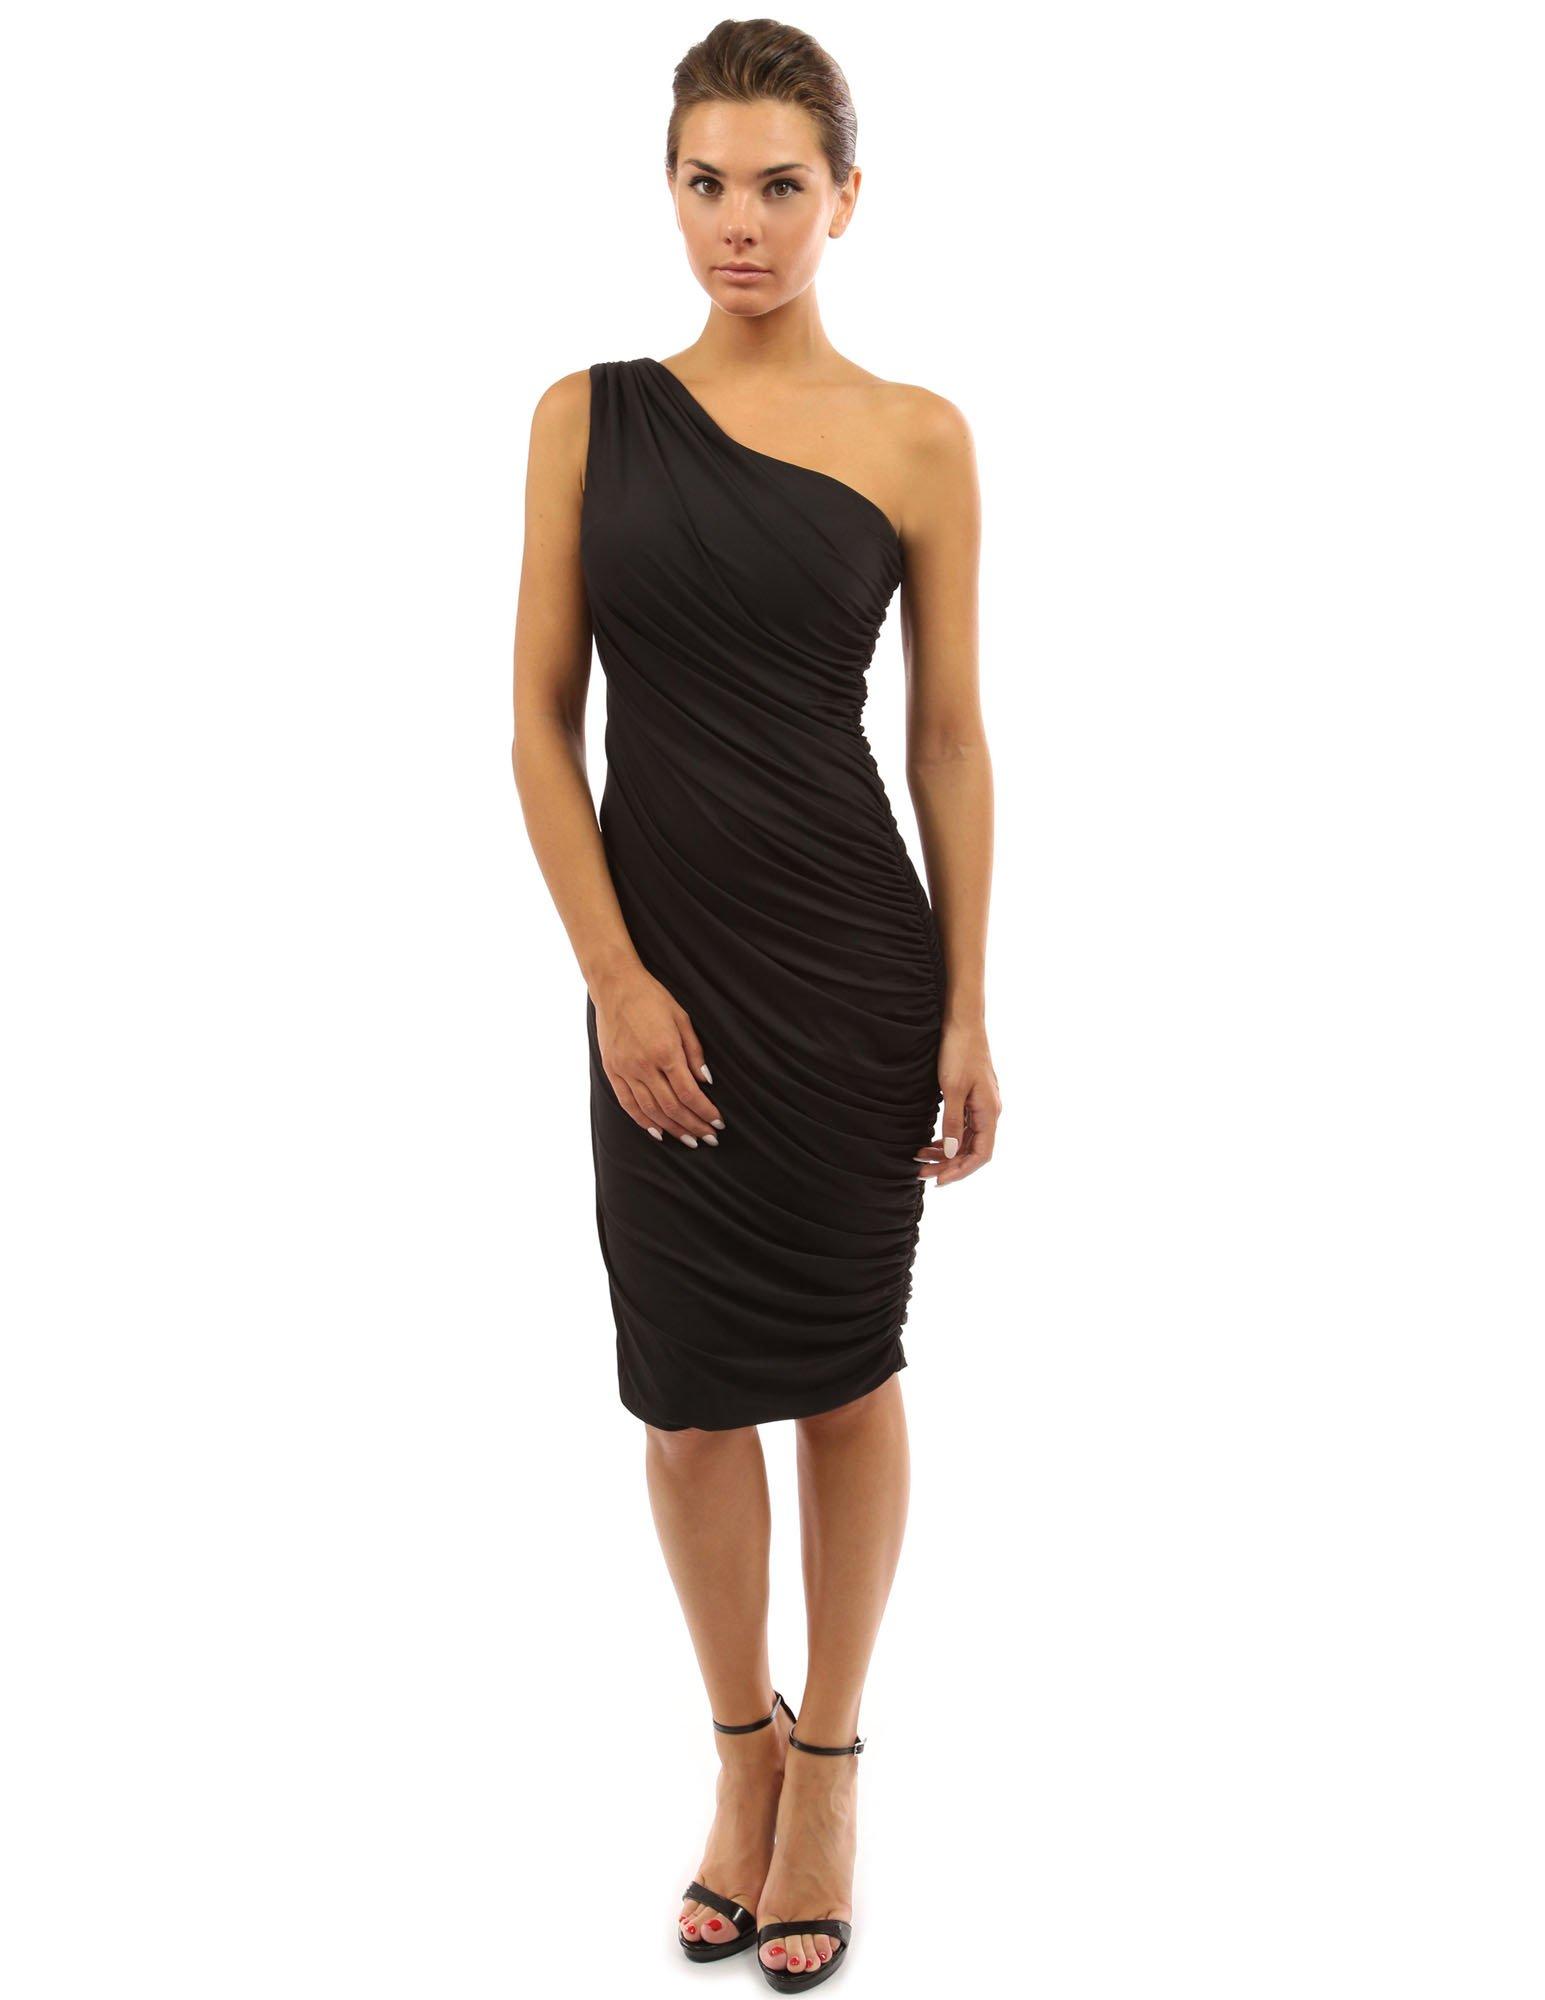 PattyBoutik Women One Shoulder Cocktail Dress (Black Large) by PattyBoutik